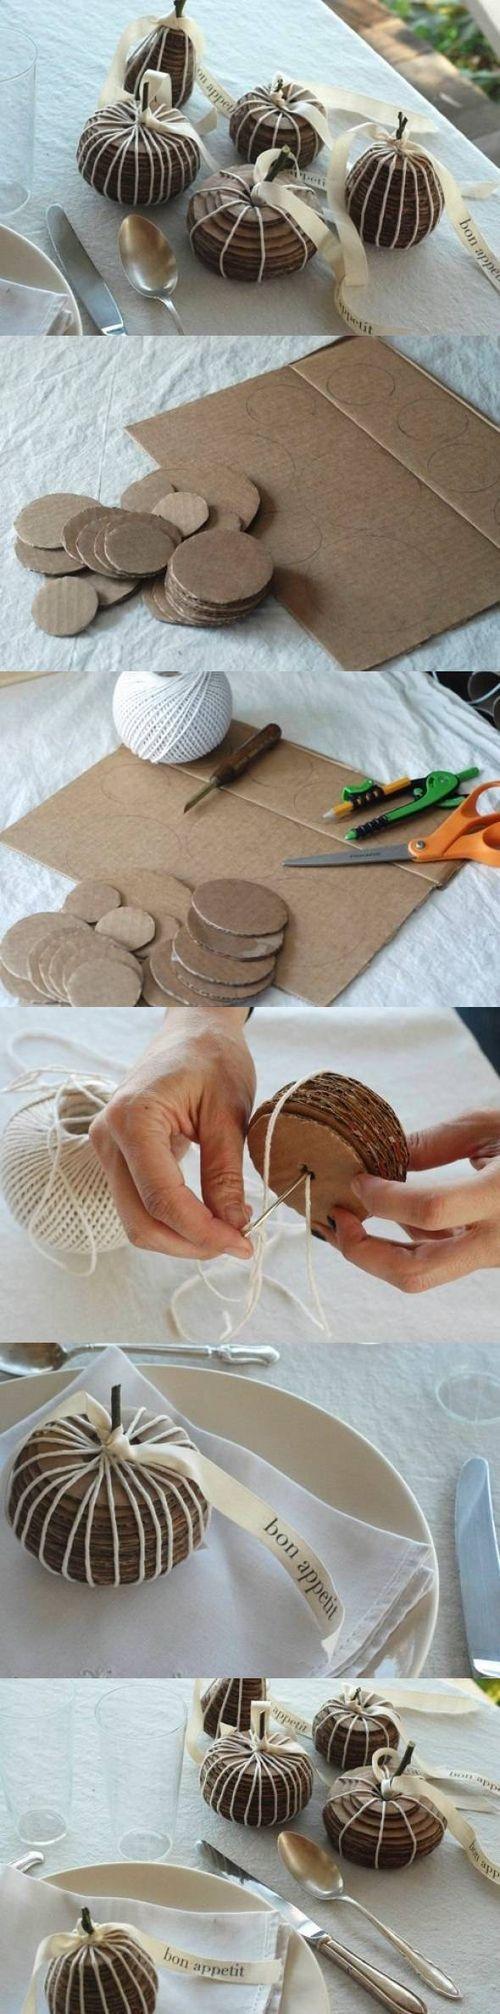 DIY Fruit of Cardboards DIY Projects / UsefulDIY.com